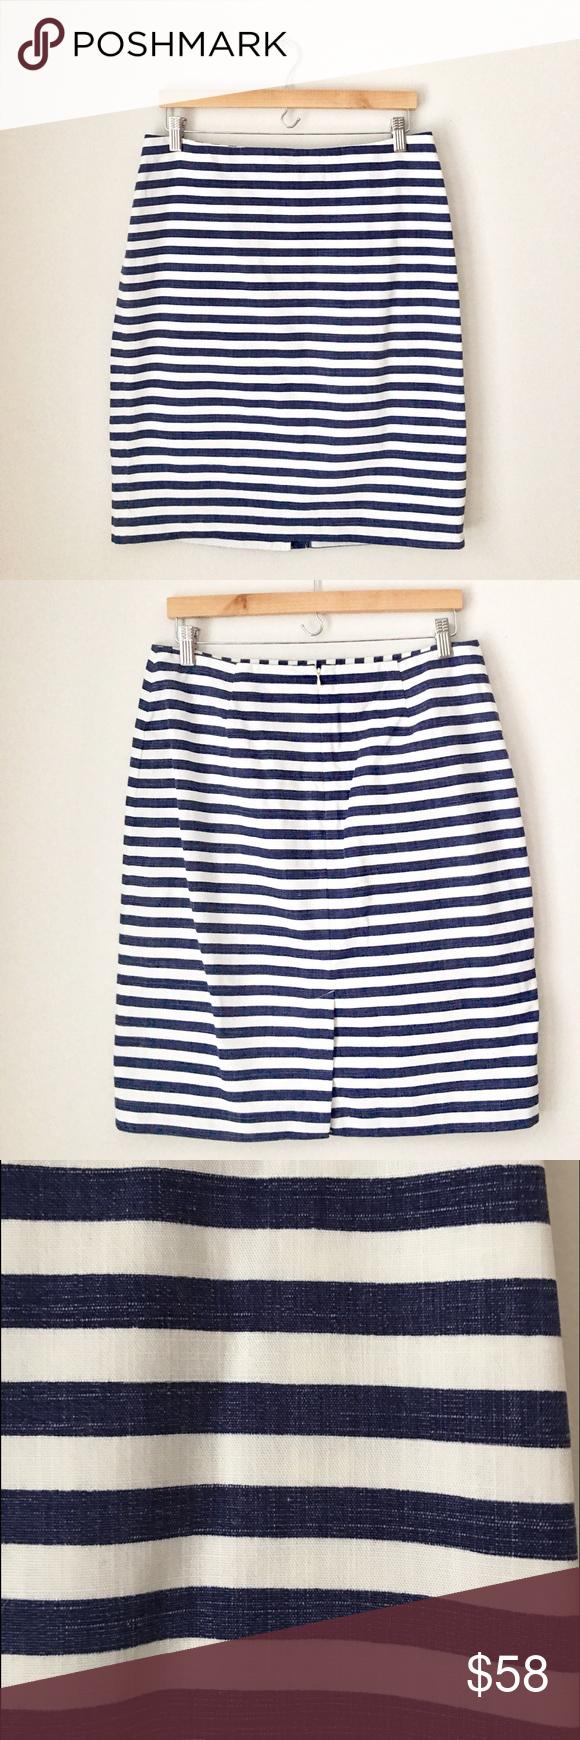 Talbots Navy & White Cotton Striped Pencil Skirt Gorgeous classically preppy blue & white striped cotton pencil skirt by Talbots. Rear zip & vent. Size 10. Like new. Talbots Skirts Pencil